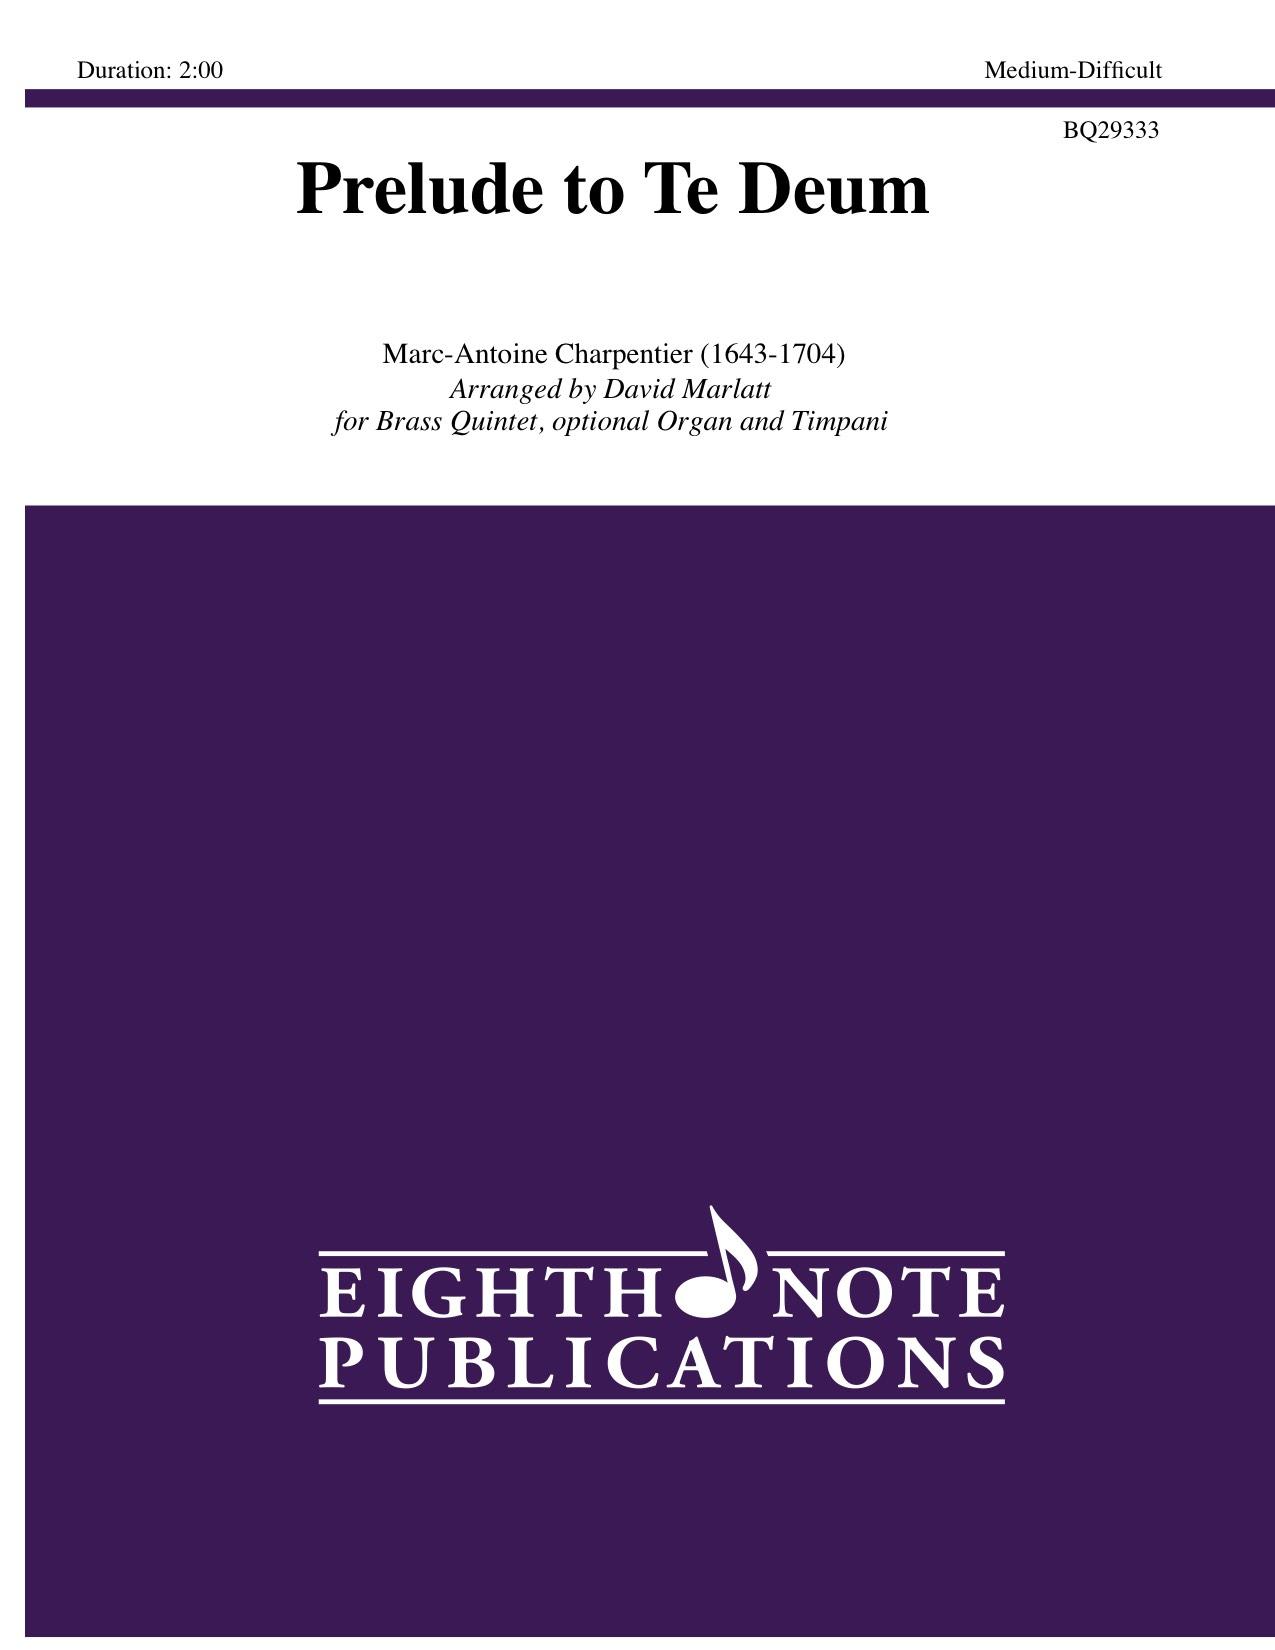 Prelude to Te Deum - Marc-Antoine Charpentier